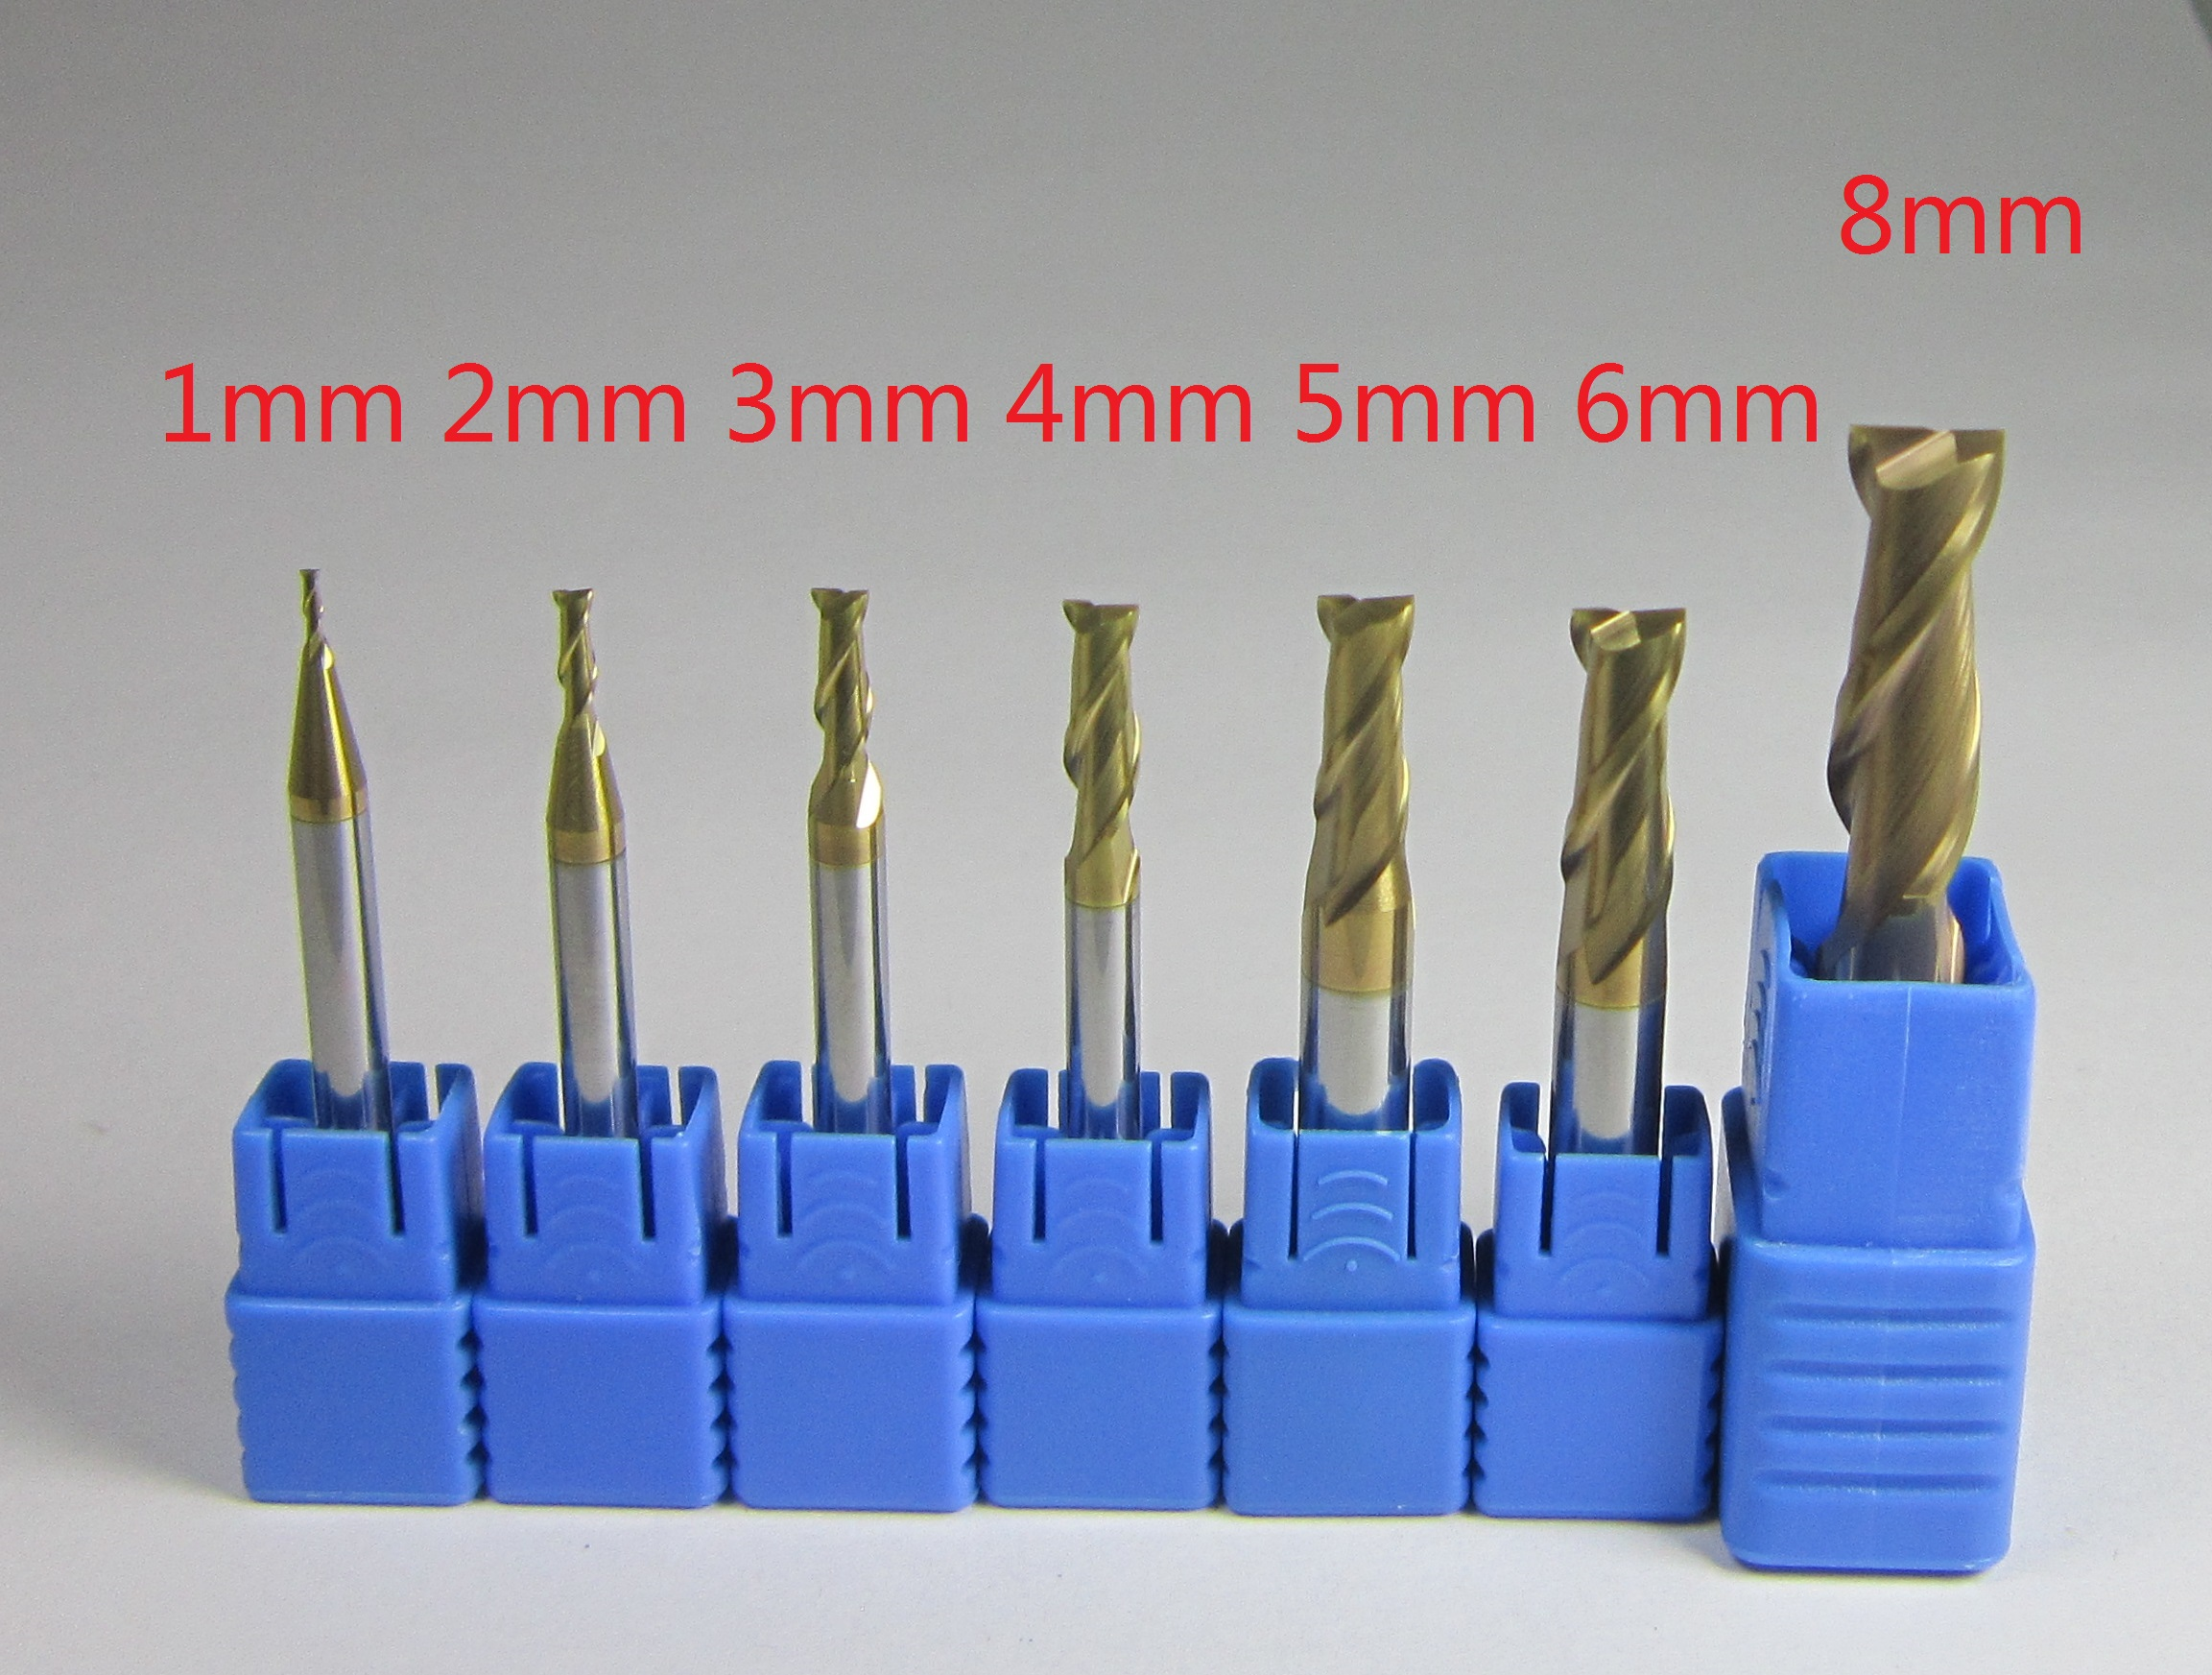 Fresa 1-8mm HRC58 3 Flutes End Mill Cutter Tungsten Carbide CNC Milling Aluminum